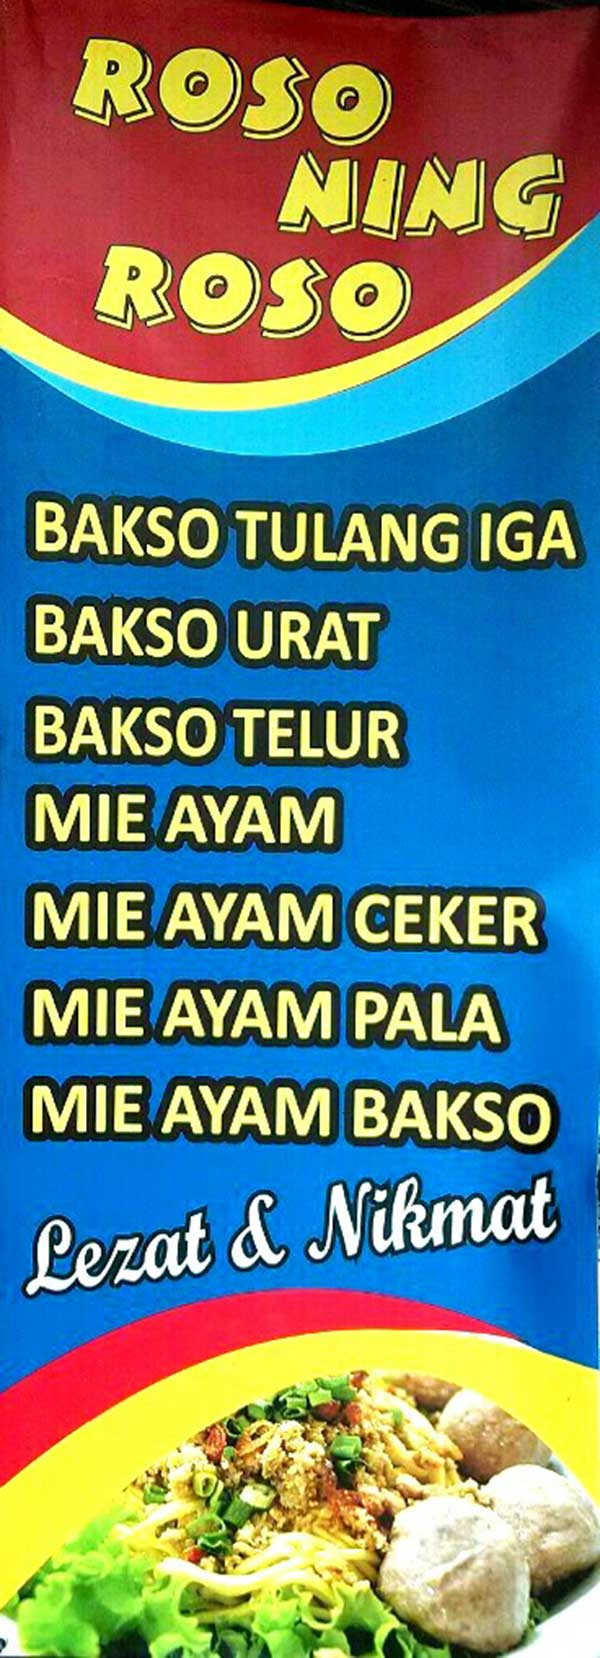 BAKSO-DAN-MIE-AYAM-ROSO-NING-ROSO2